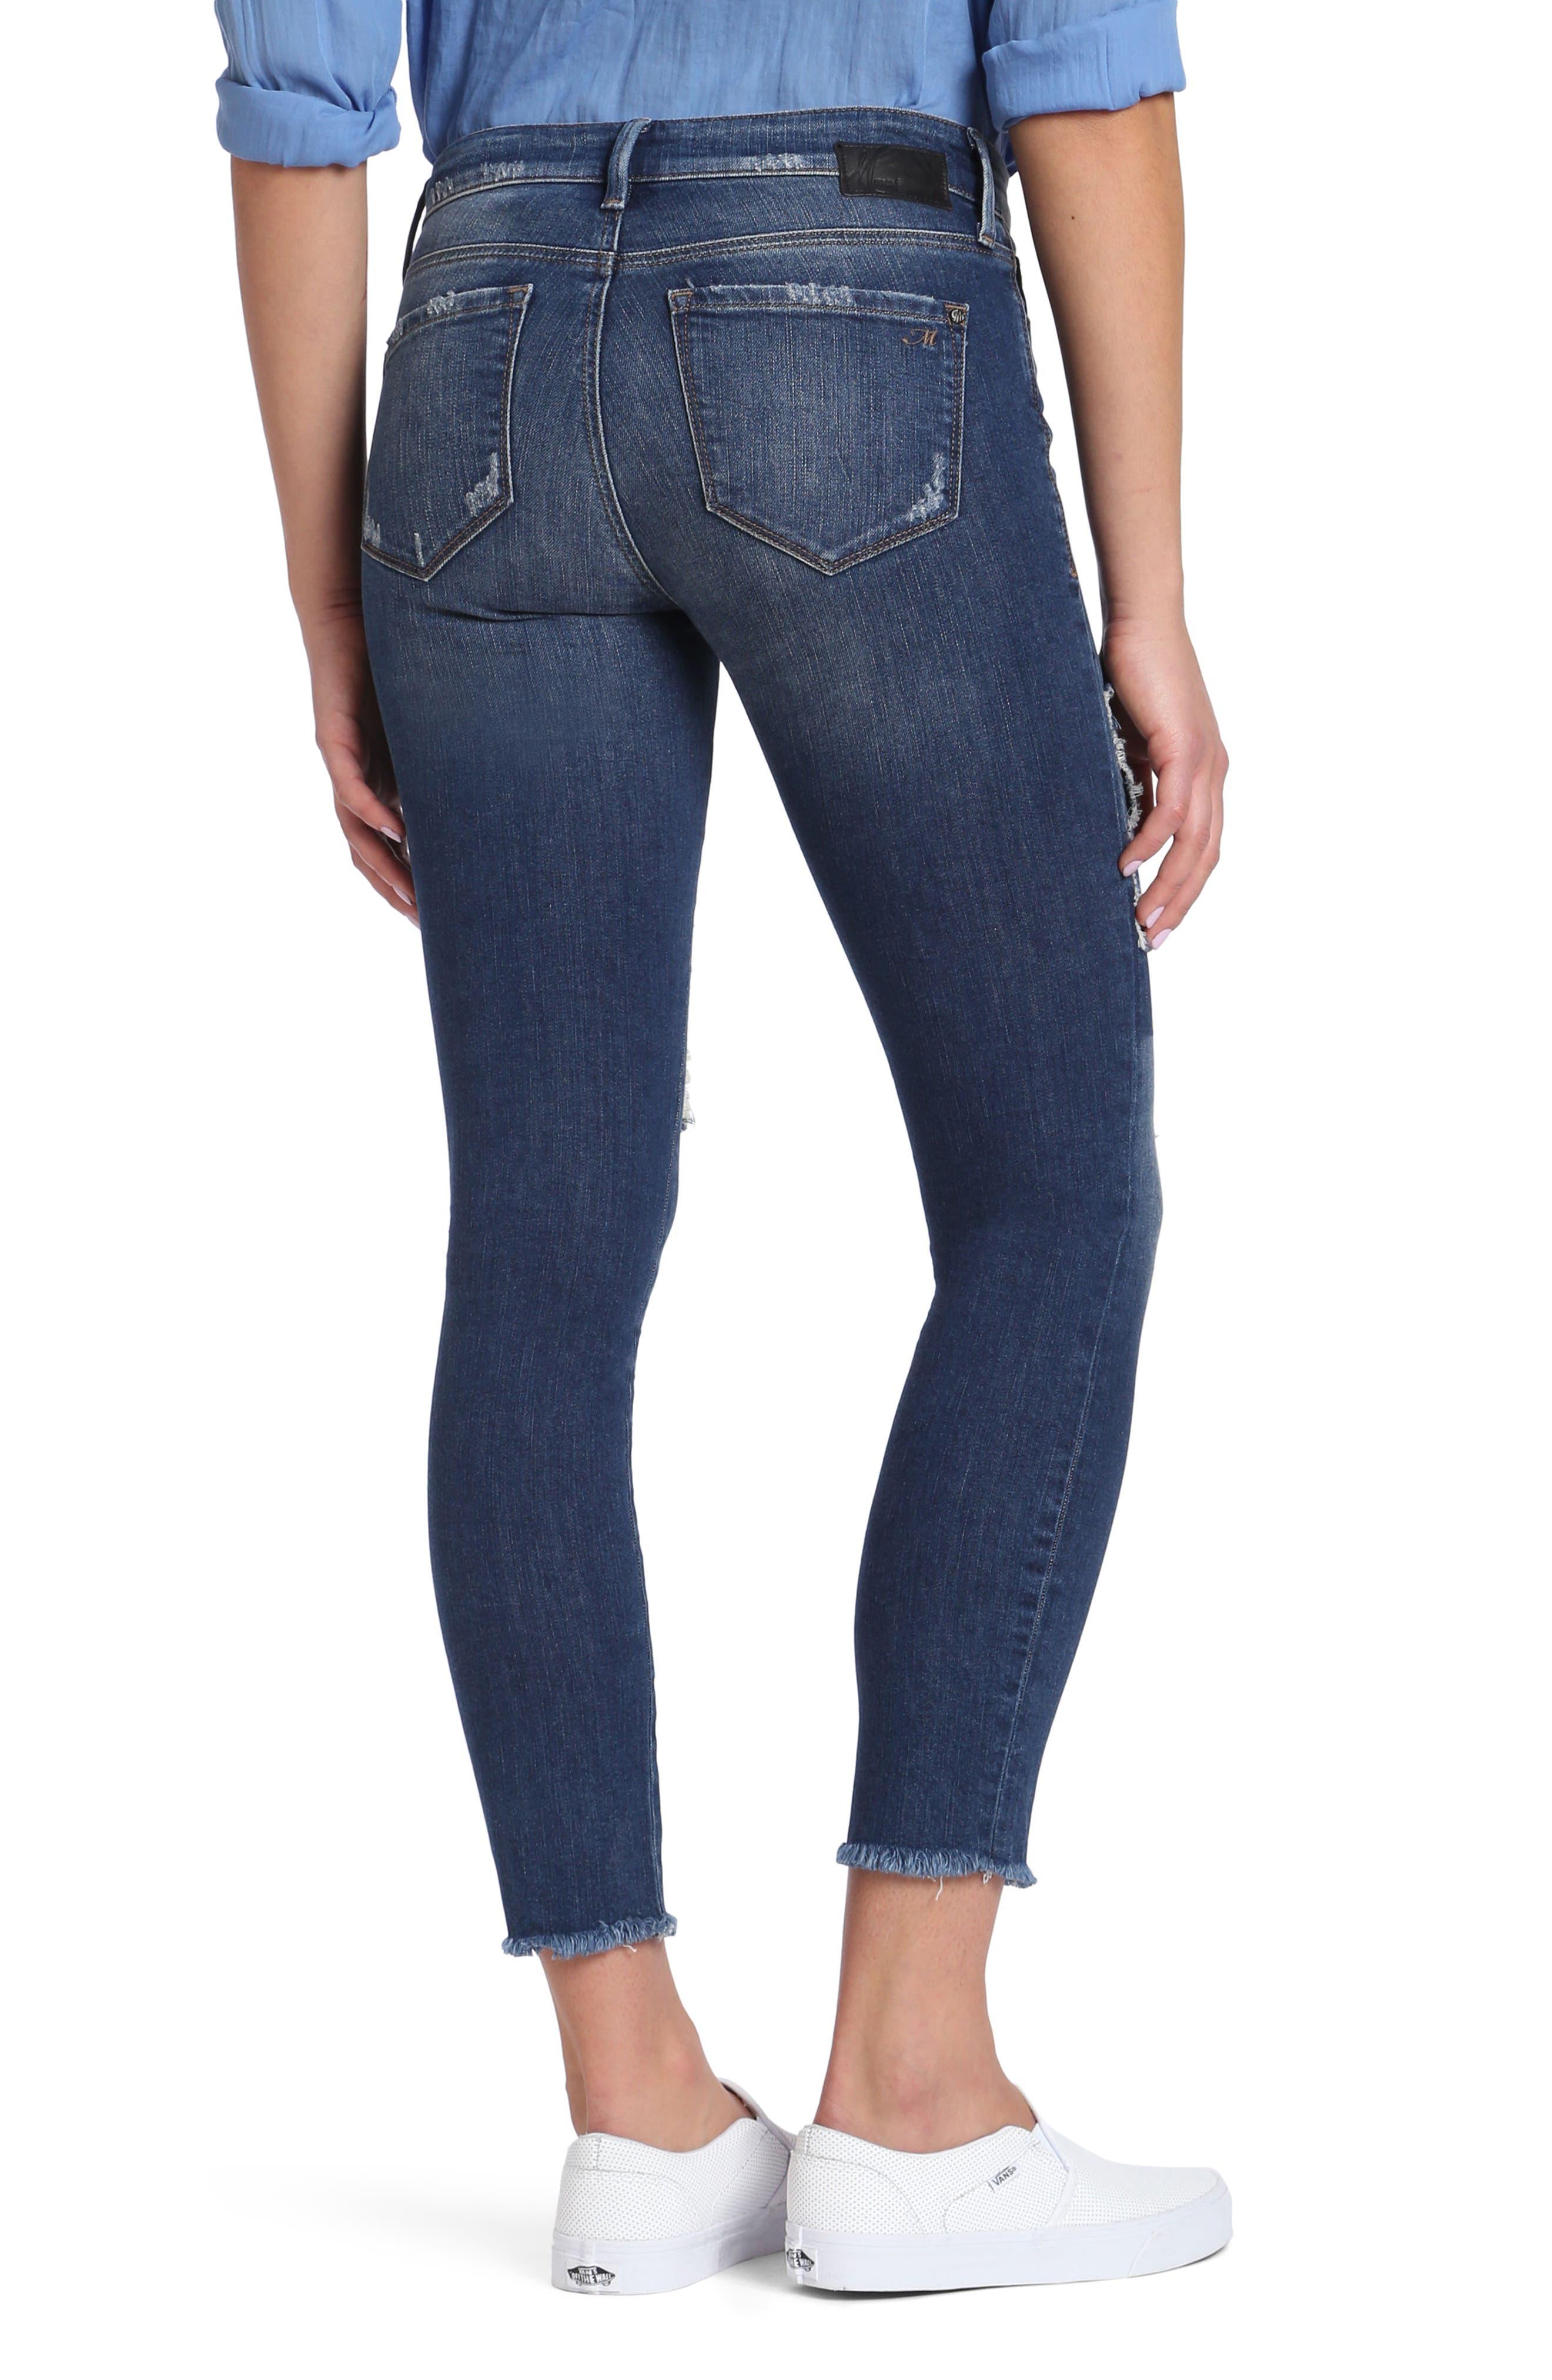 Alternate Image 2  - Mavi Jeans Adriana Patched Stretch Skinny Jeans (Indigo Patched Vintage)